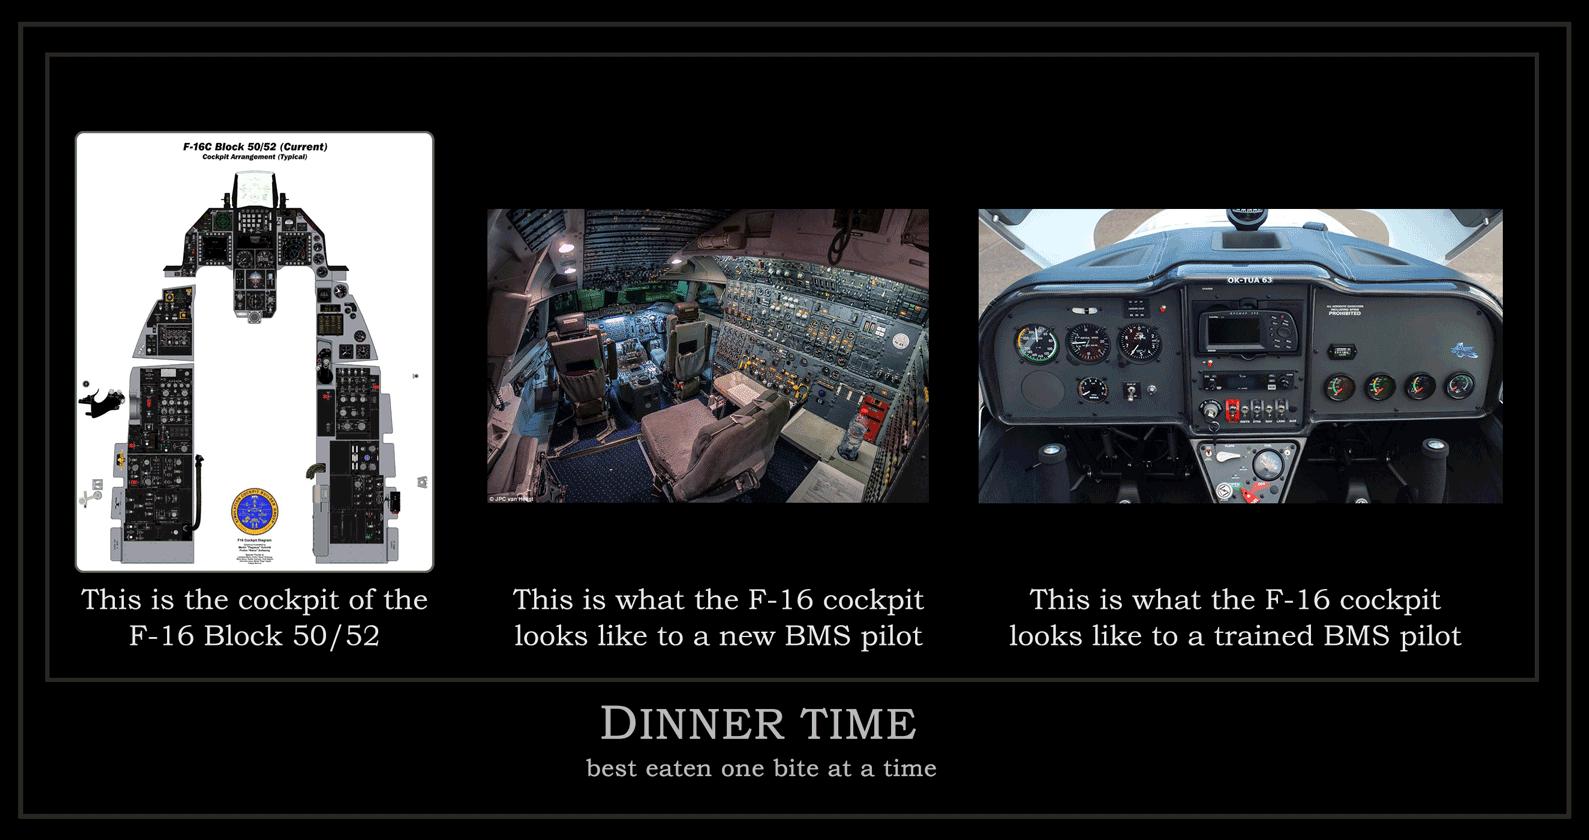 F-16 Cockpit ..so many buttons